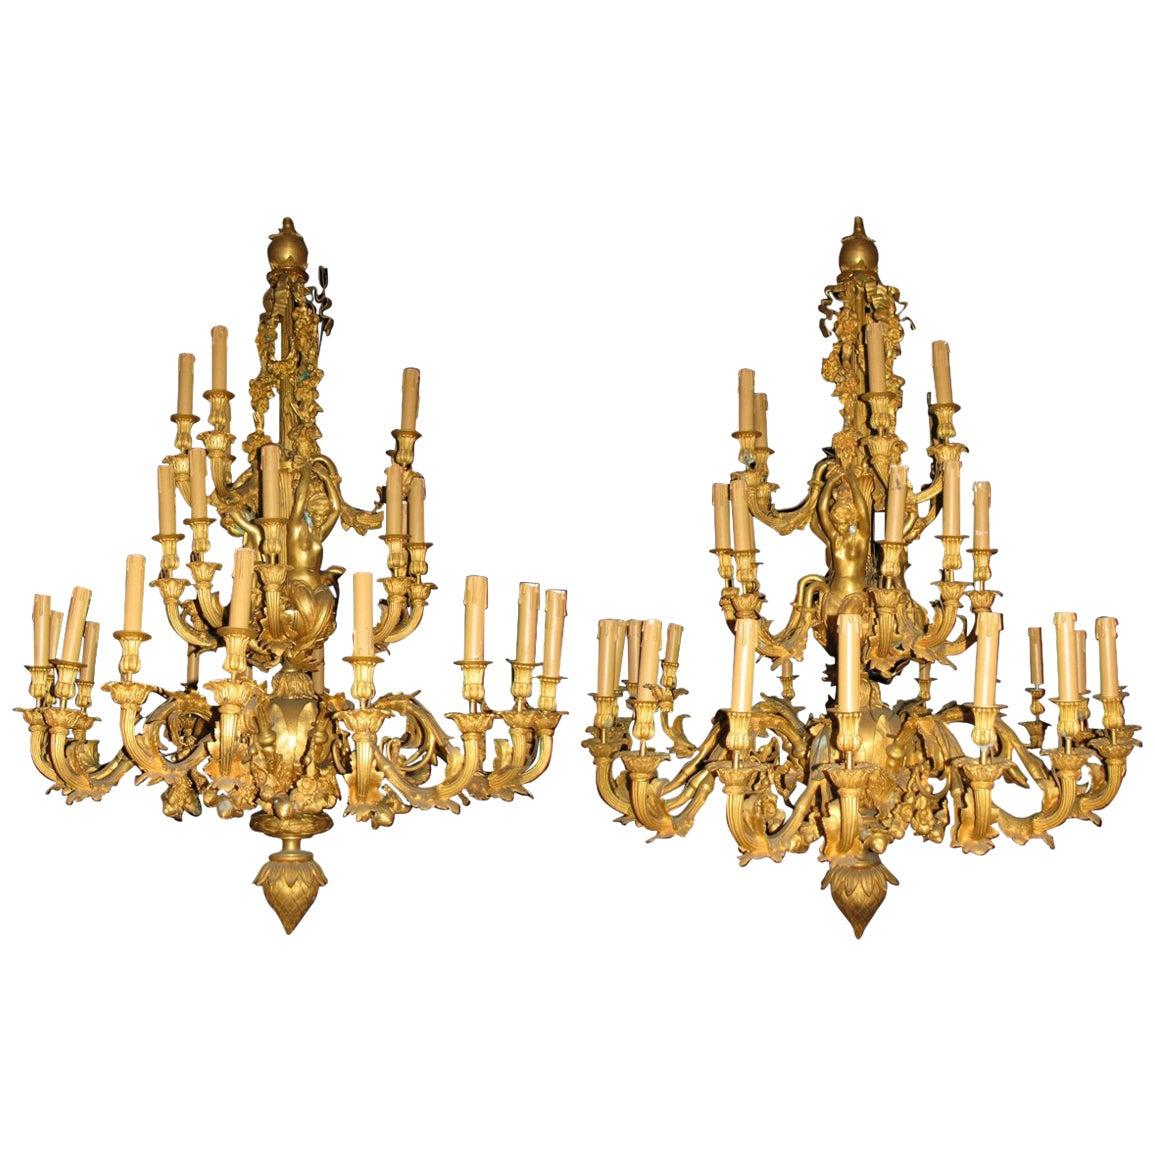 Pair of Louis XV Style Thirty-Three-Light Ormolu Figural Chandeliers